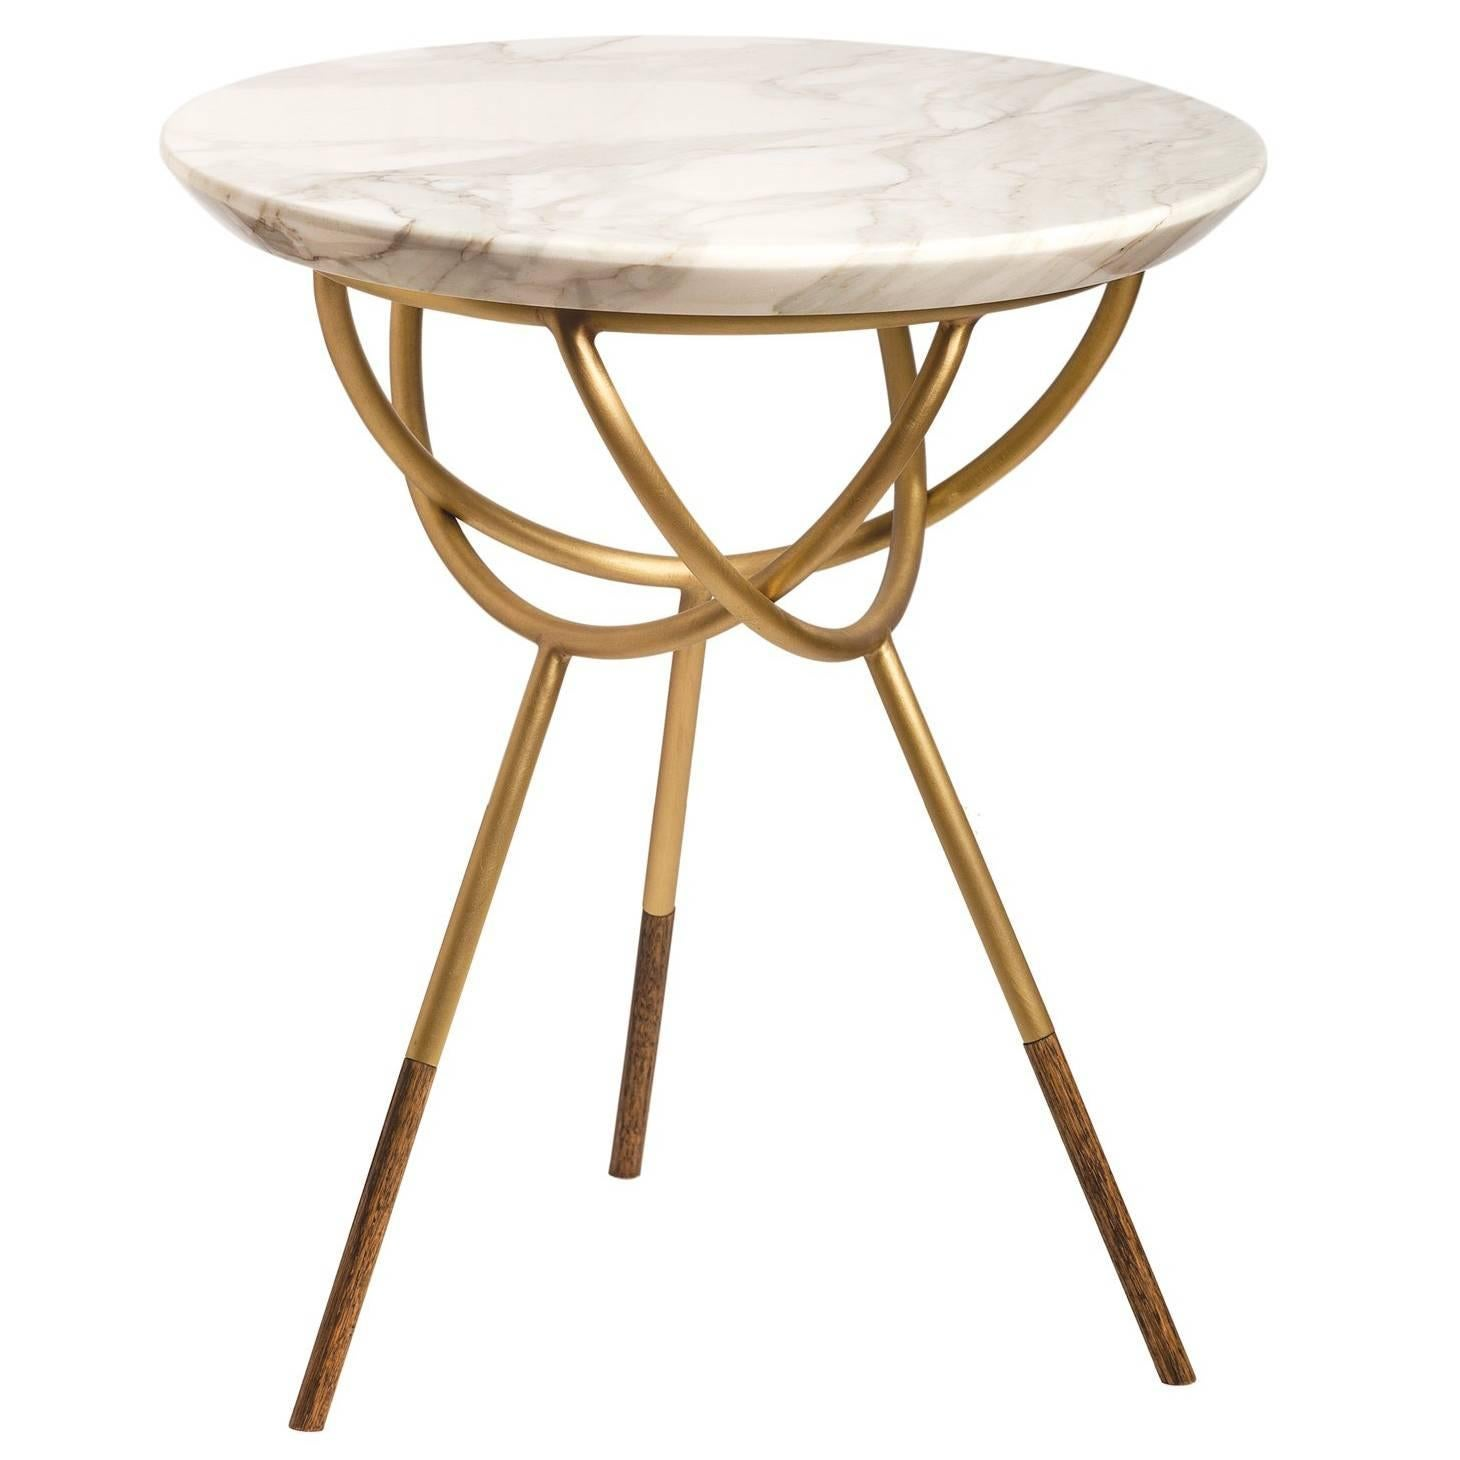 Atlas Brushed Brass Side Table by AVRAM RUSU STUDIO